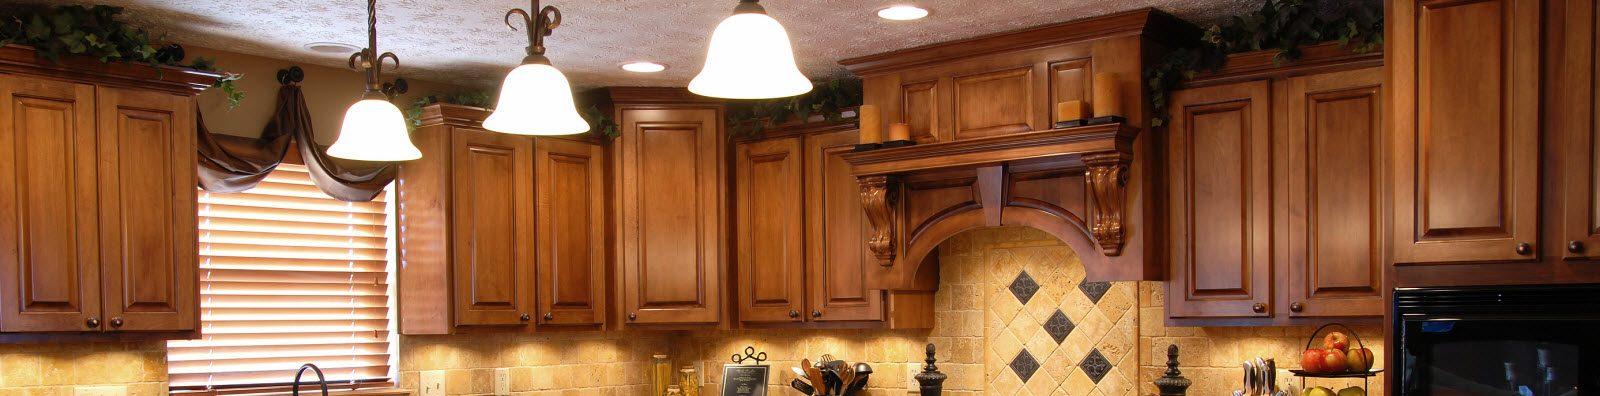 Commercial Lighting Contractors Simon Electric Llc